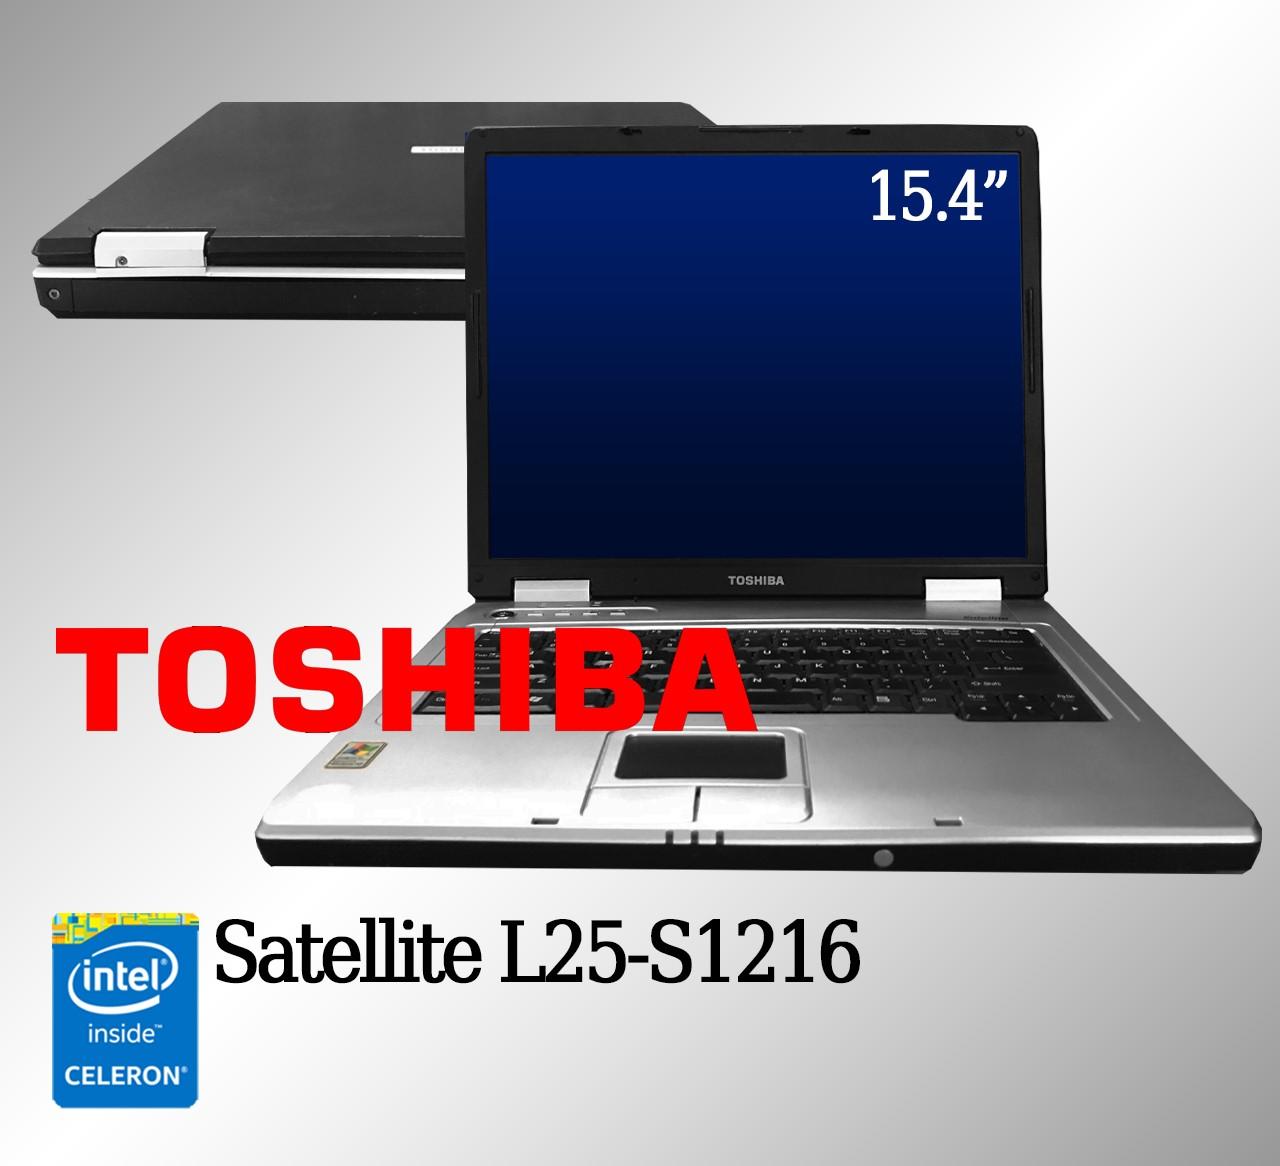 Laptop Toshiba Satellite L25-S1216Intel Celeron 1.5G de Memória RAM e 12 GB Disco